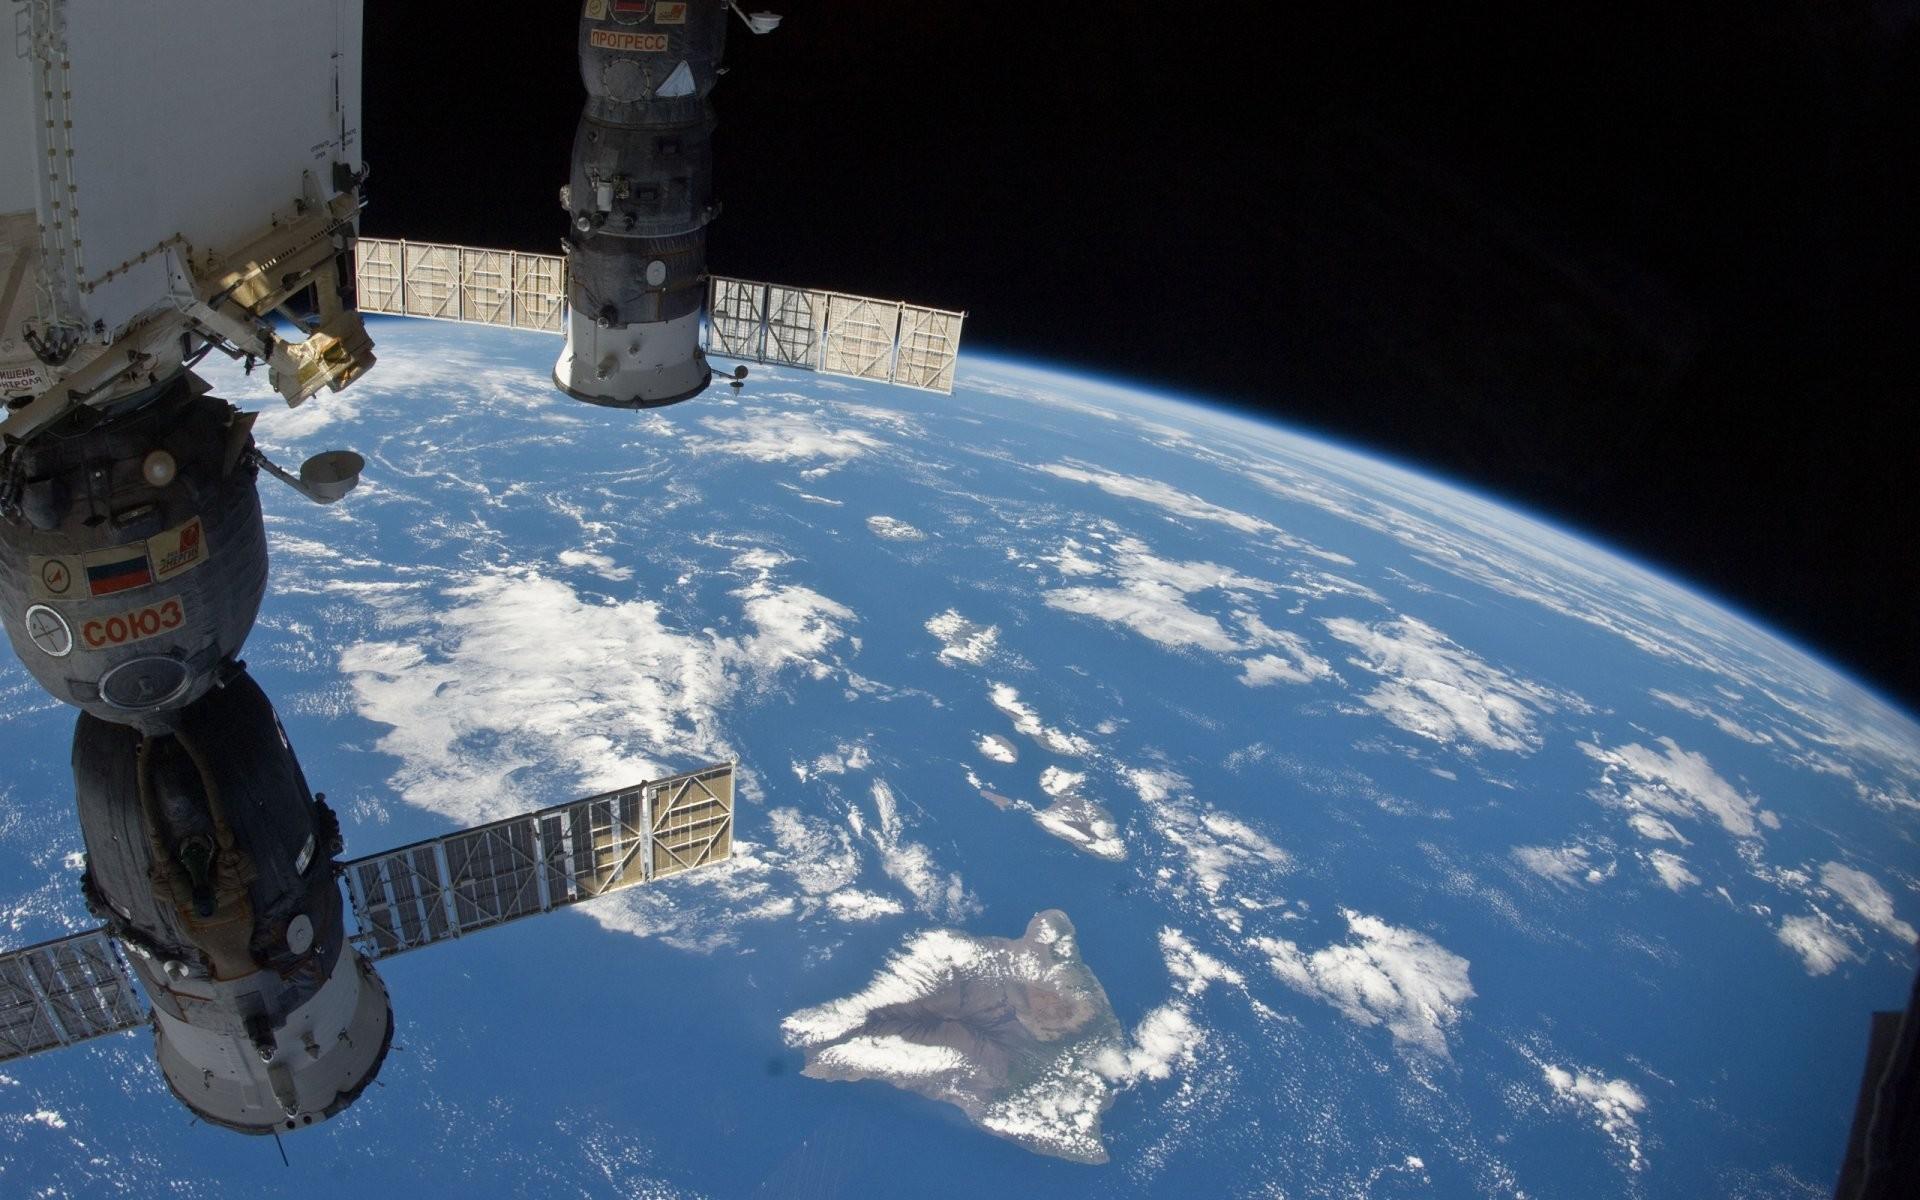 International Space Station 509849